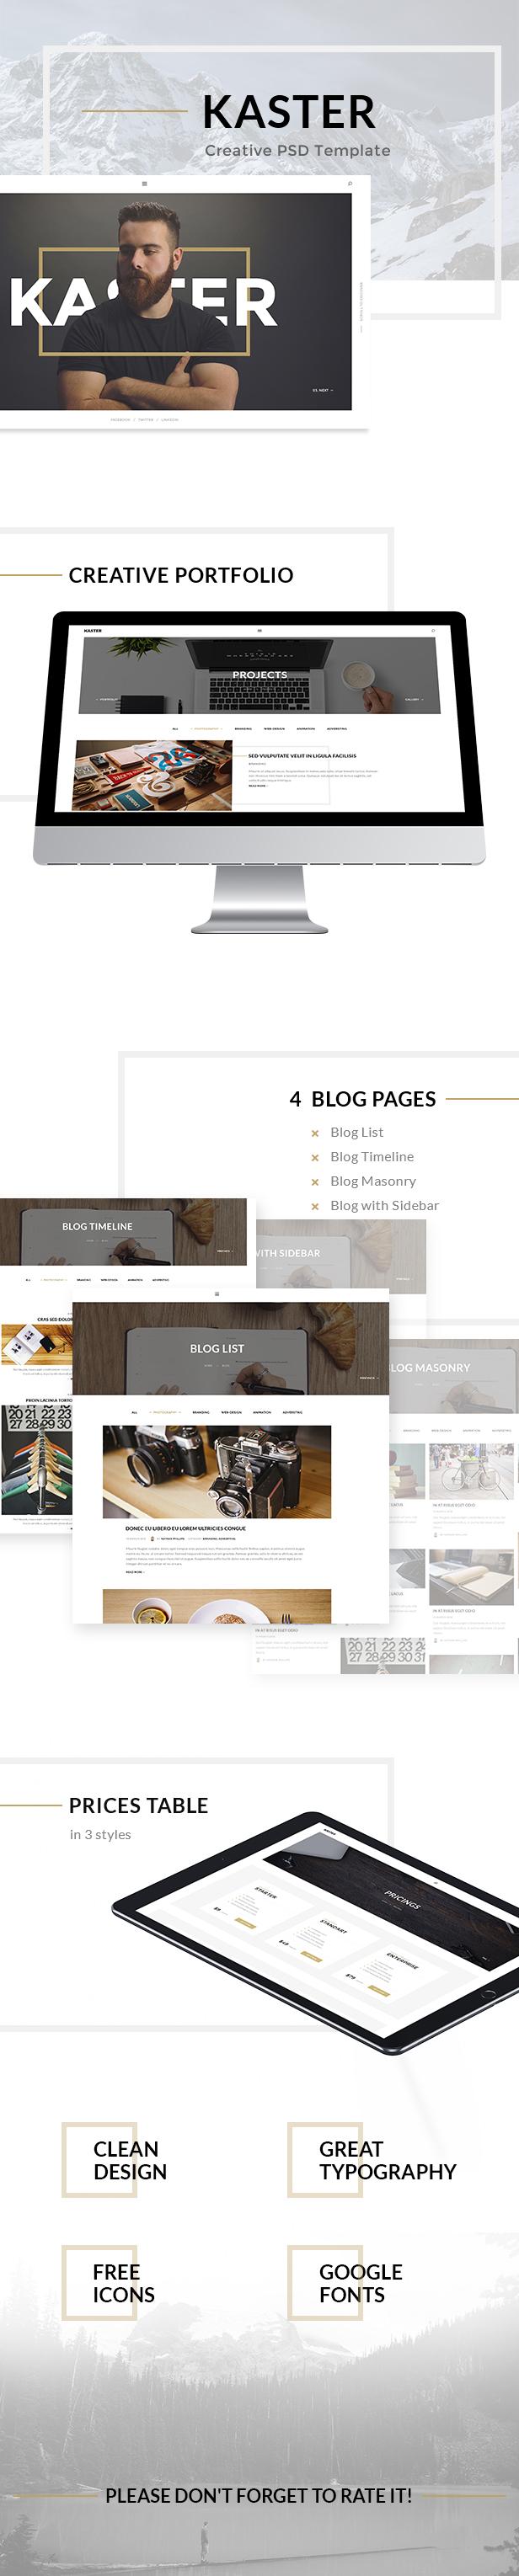 Kaster — Multipurpose Creative Agency, Personal Portfolio, Modern Blog PSD Template - 1